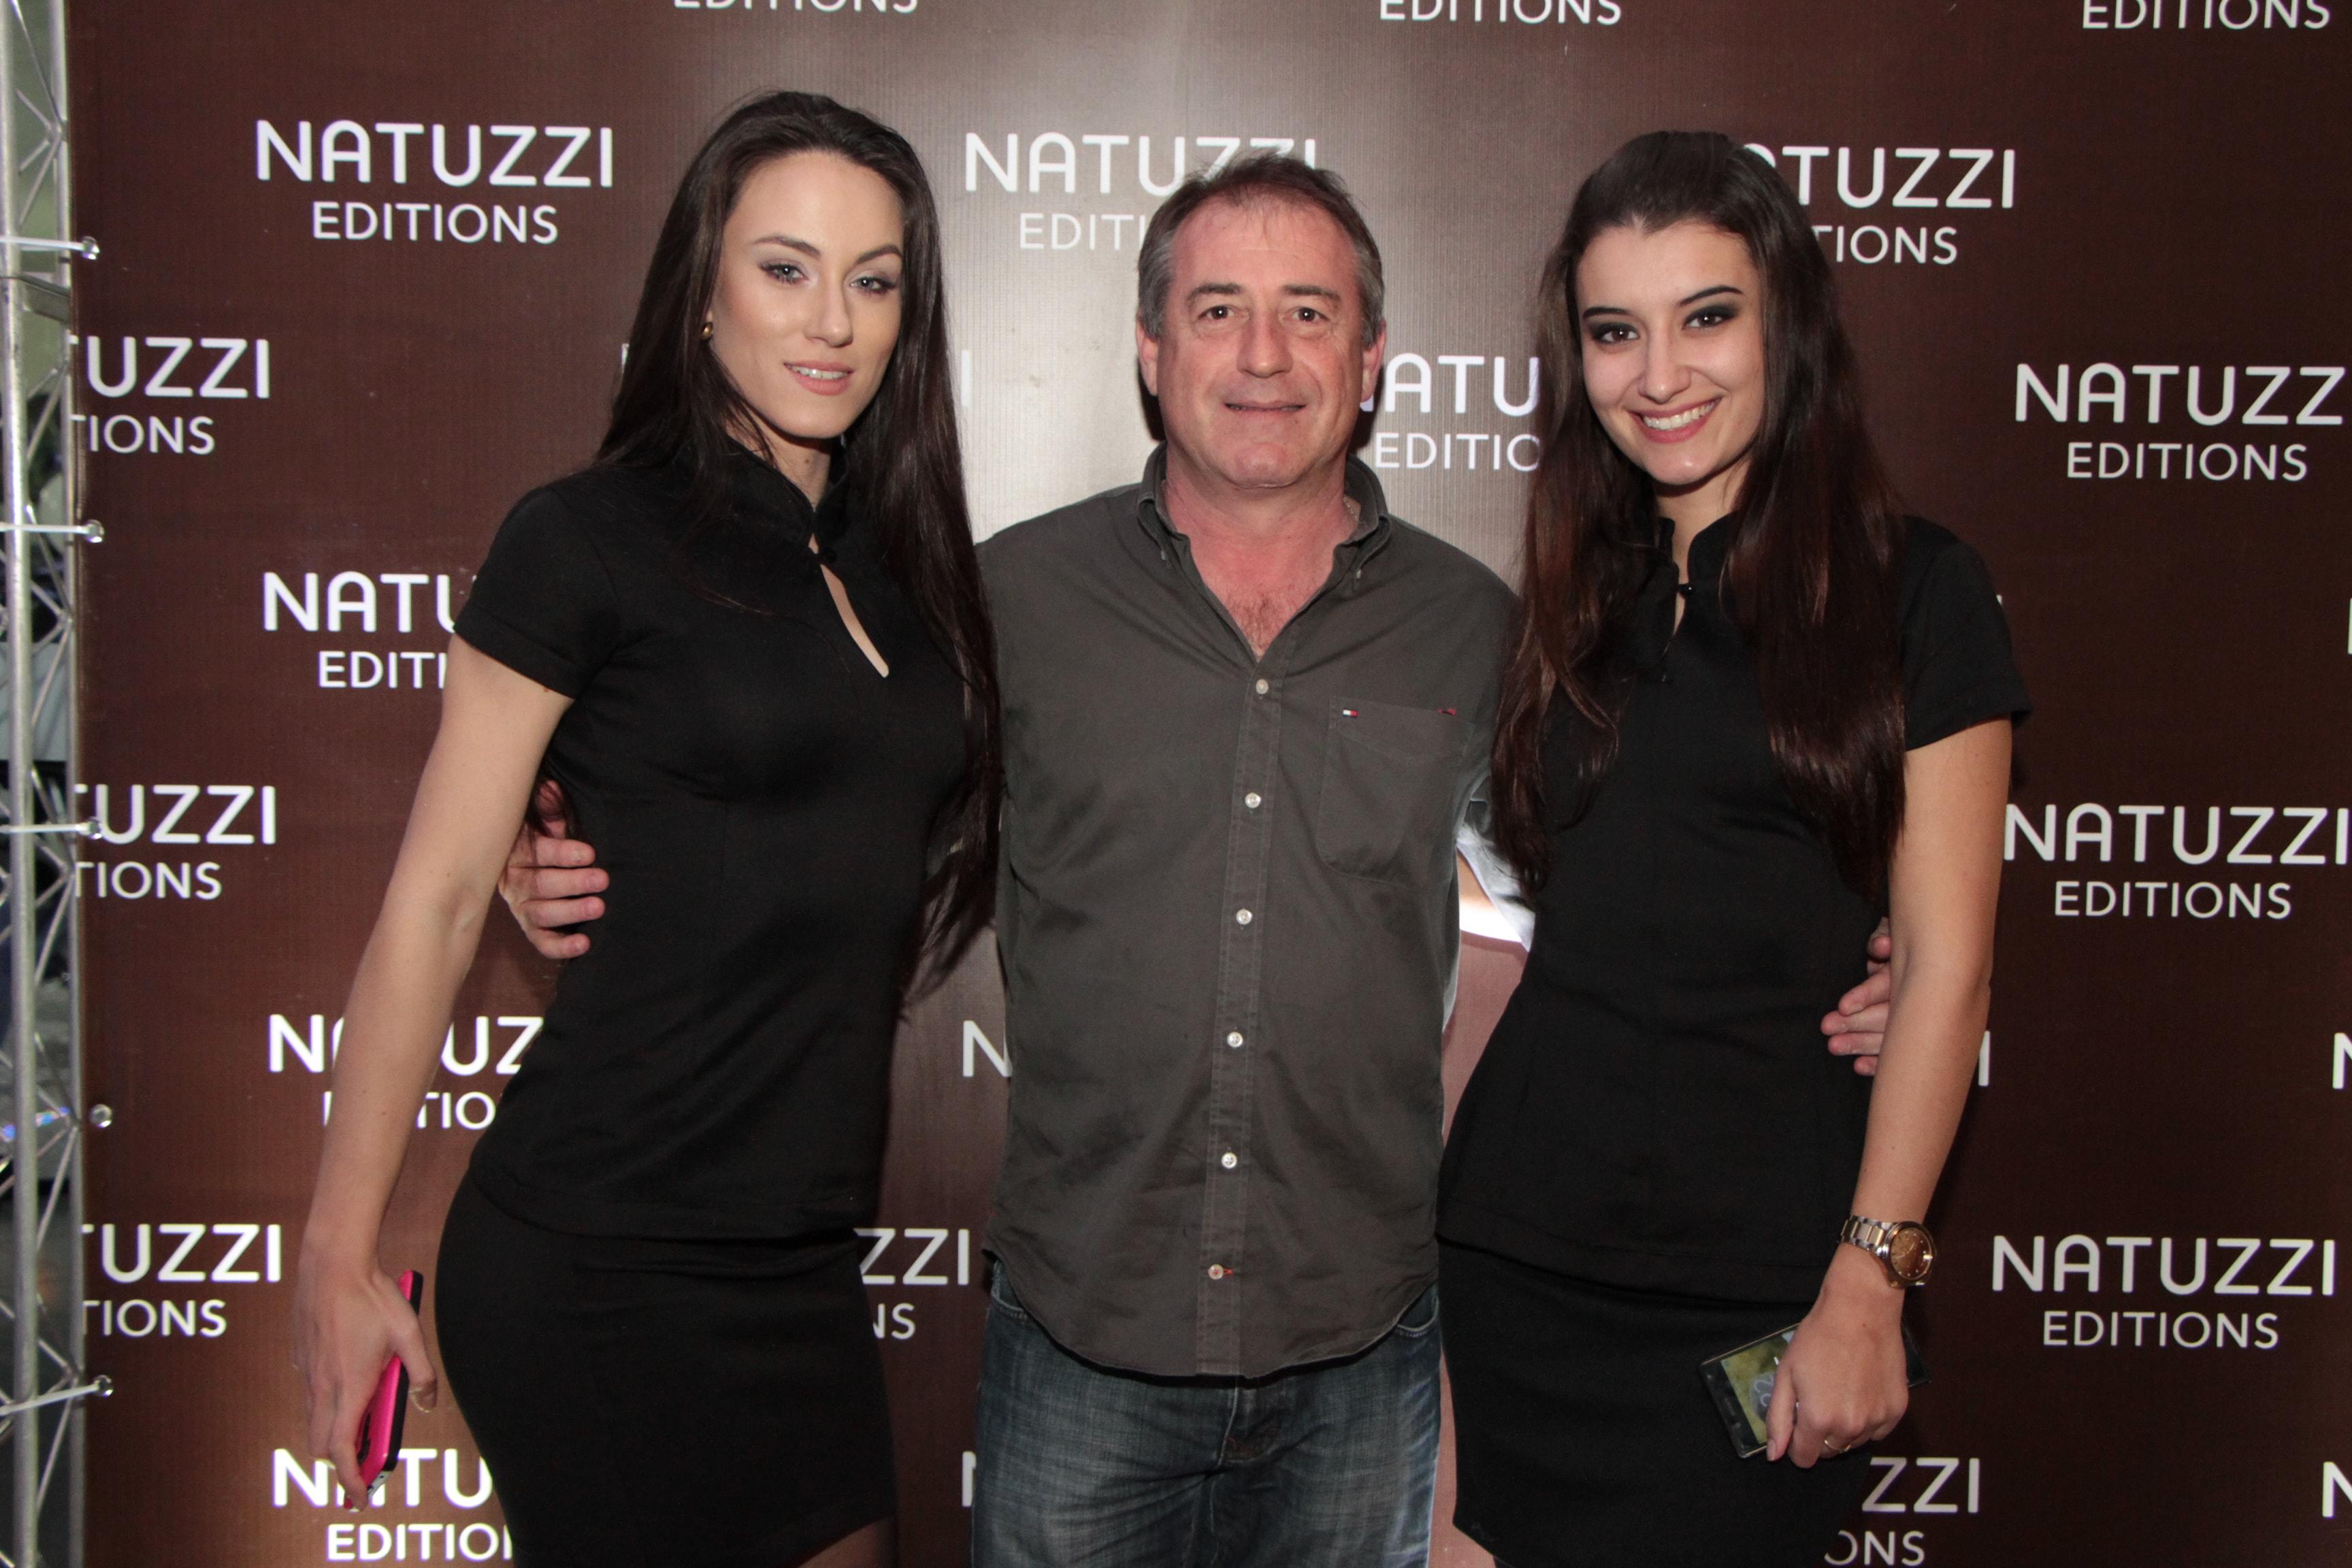 Natuzzi (119)-min.JPG